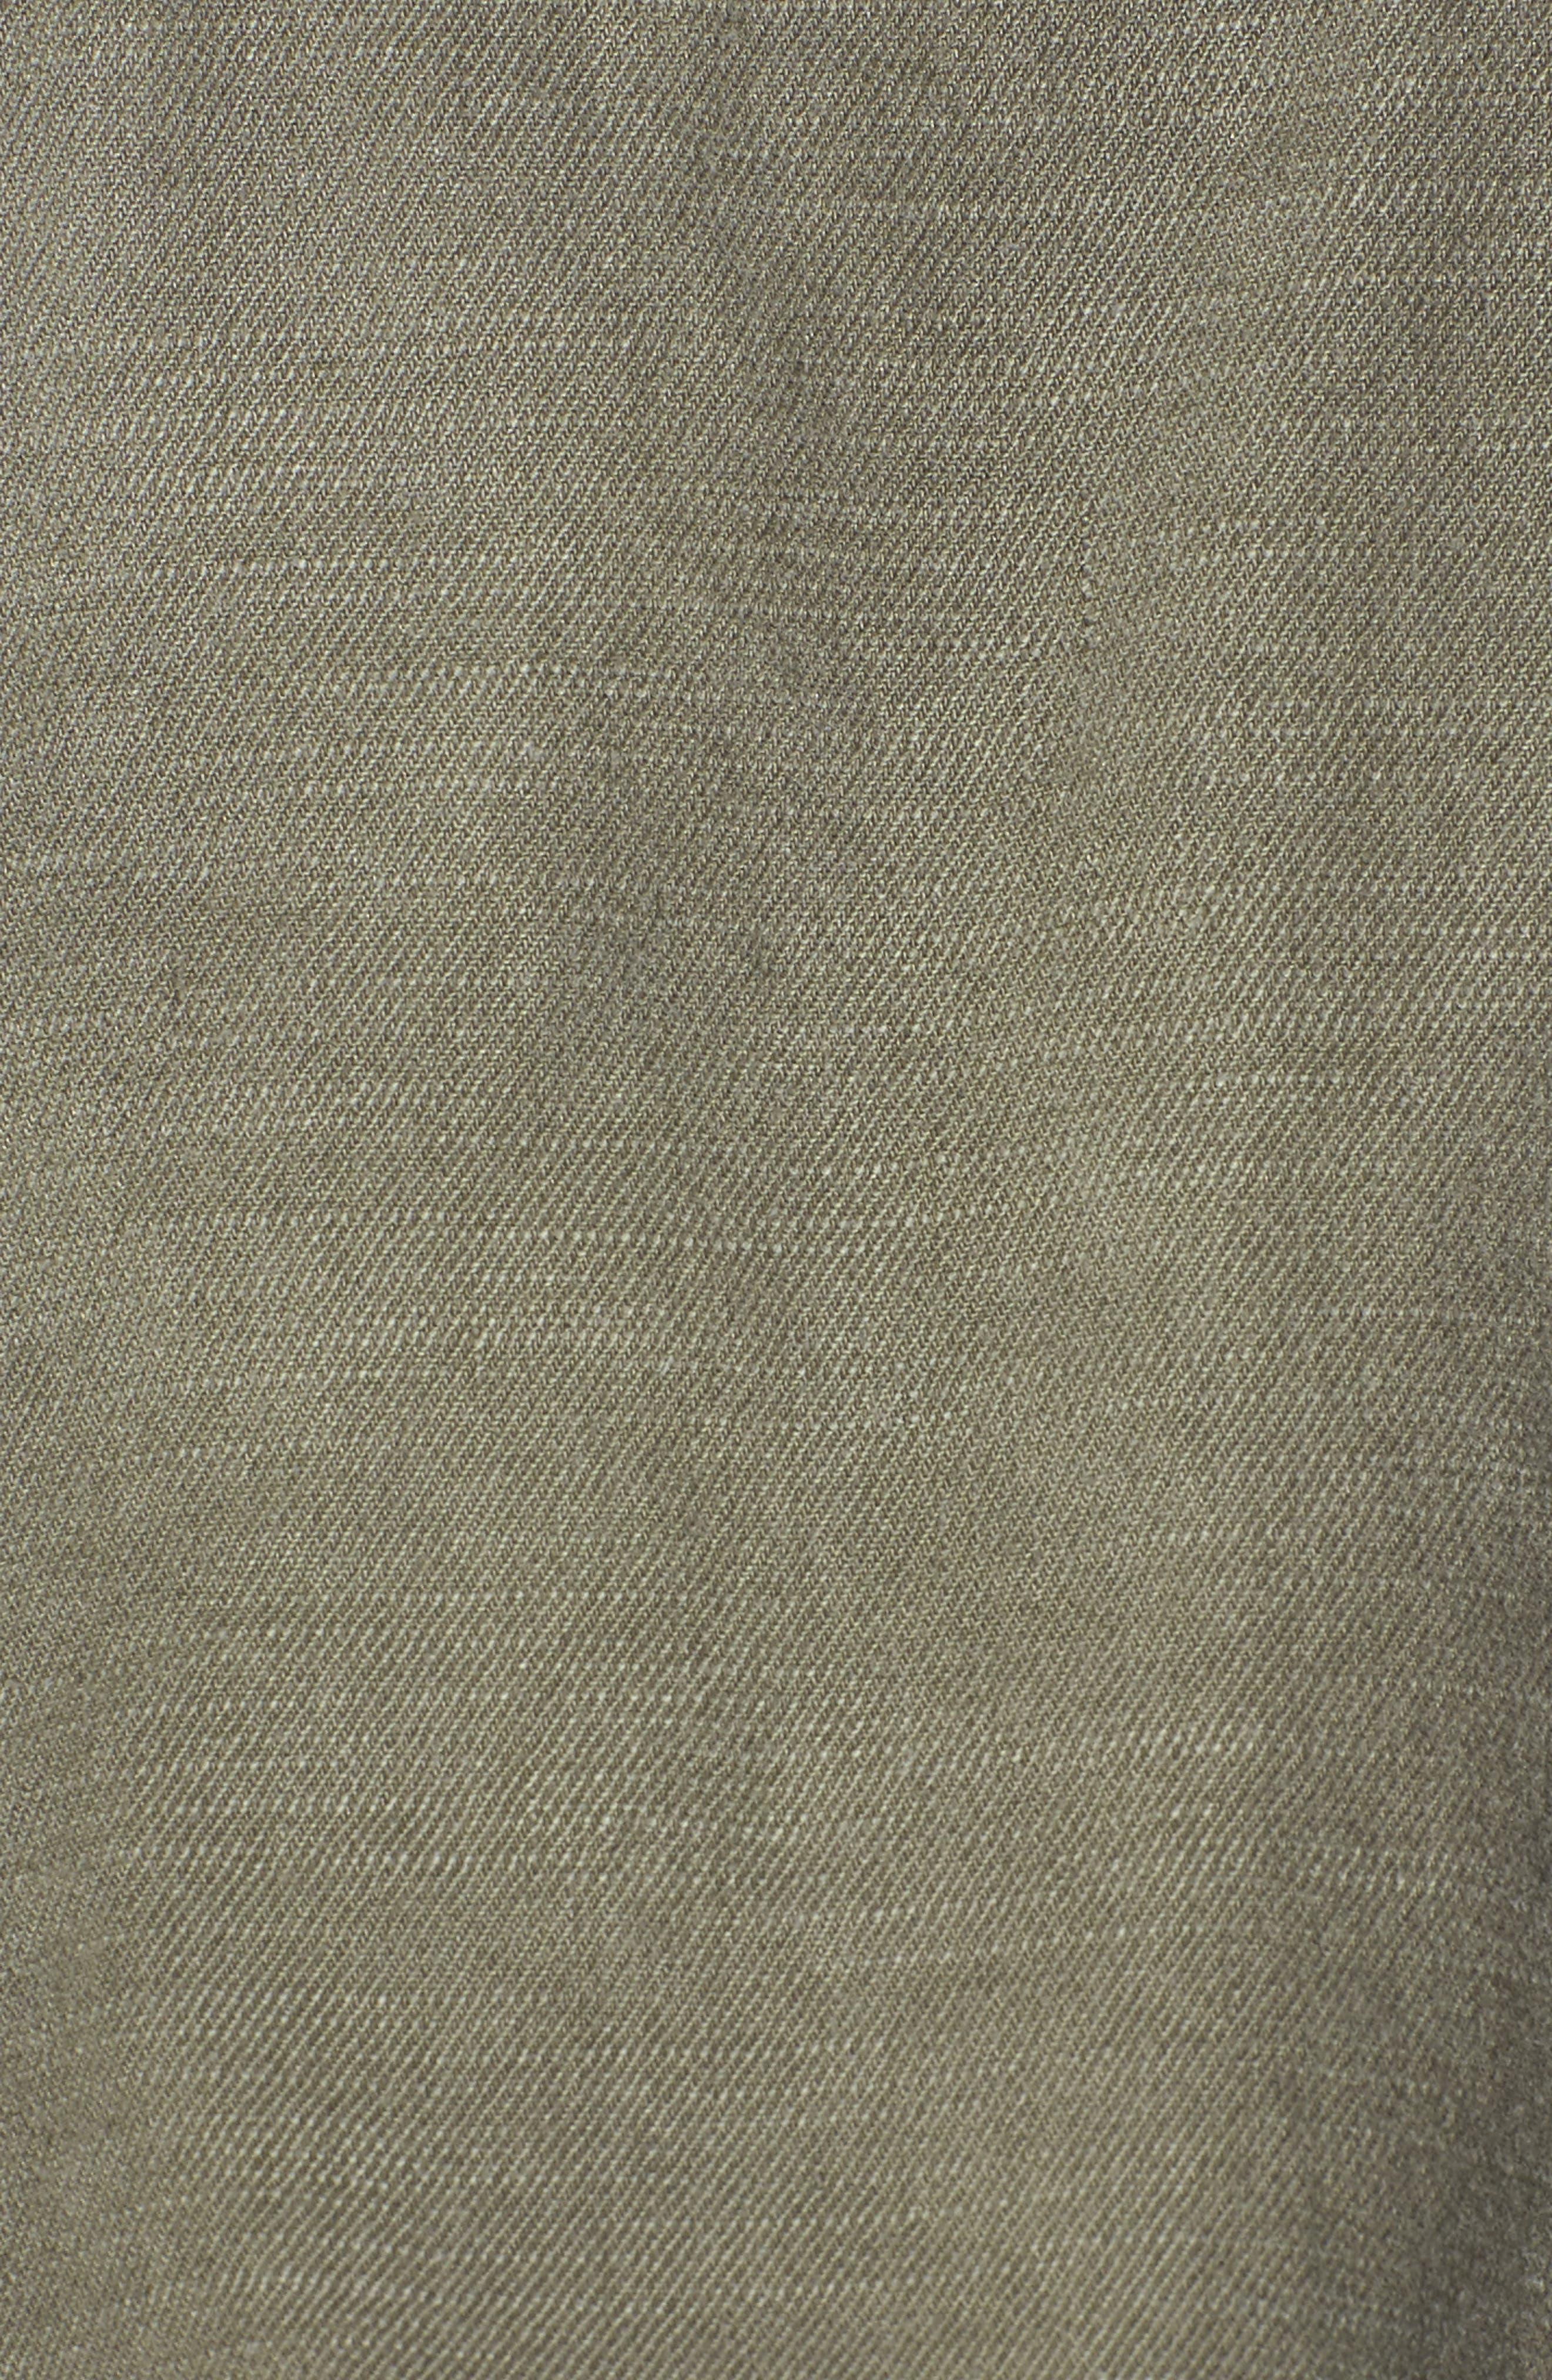 Linen Blend Drape Jacket,                             Alternate thumbnail 11, color,